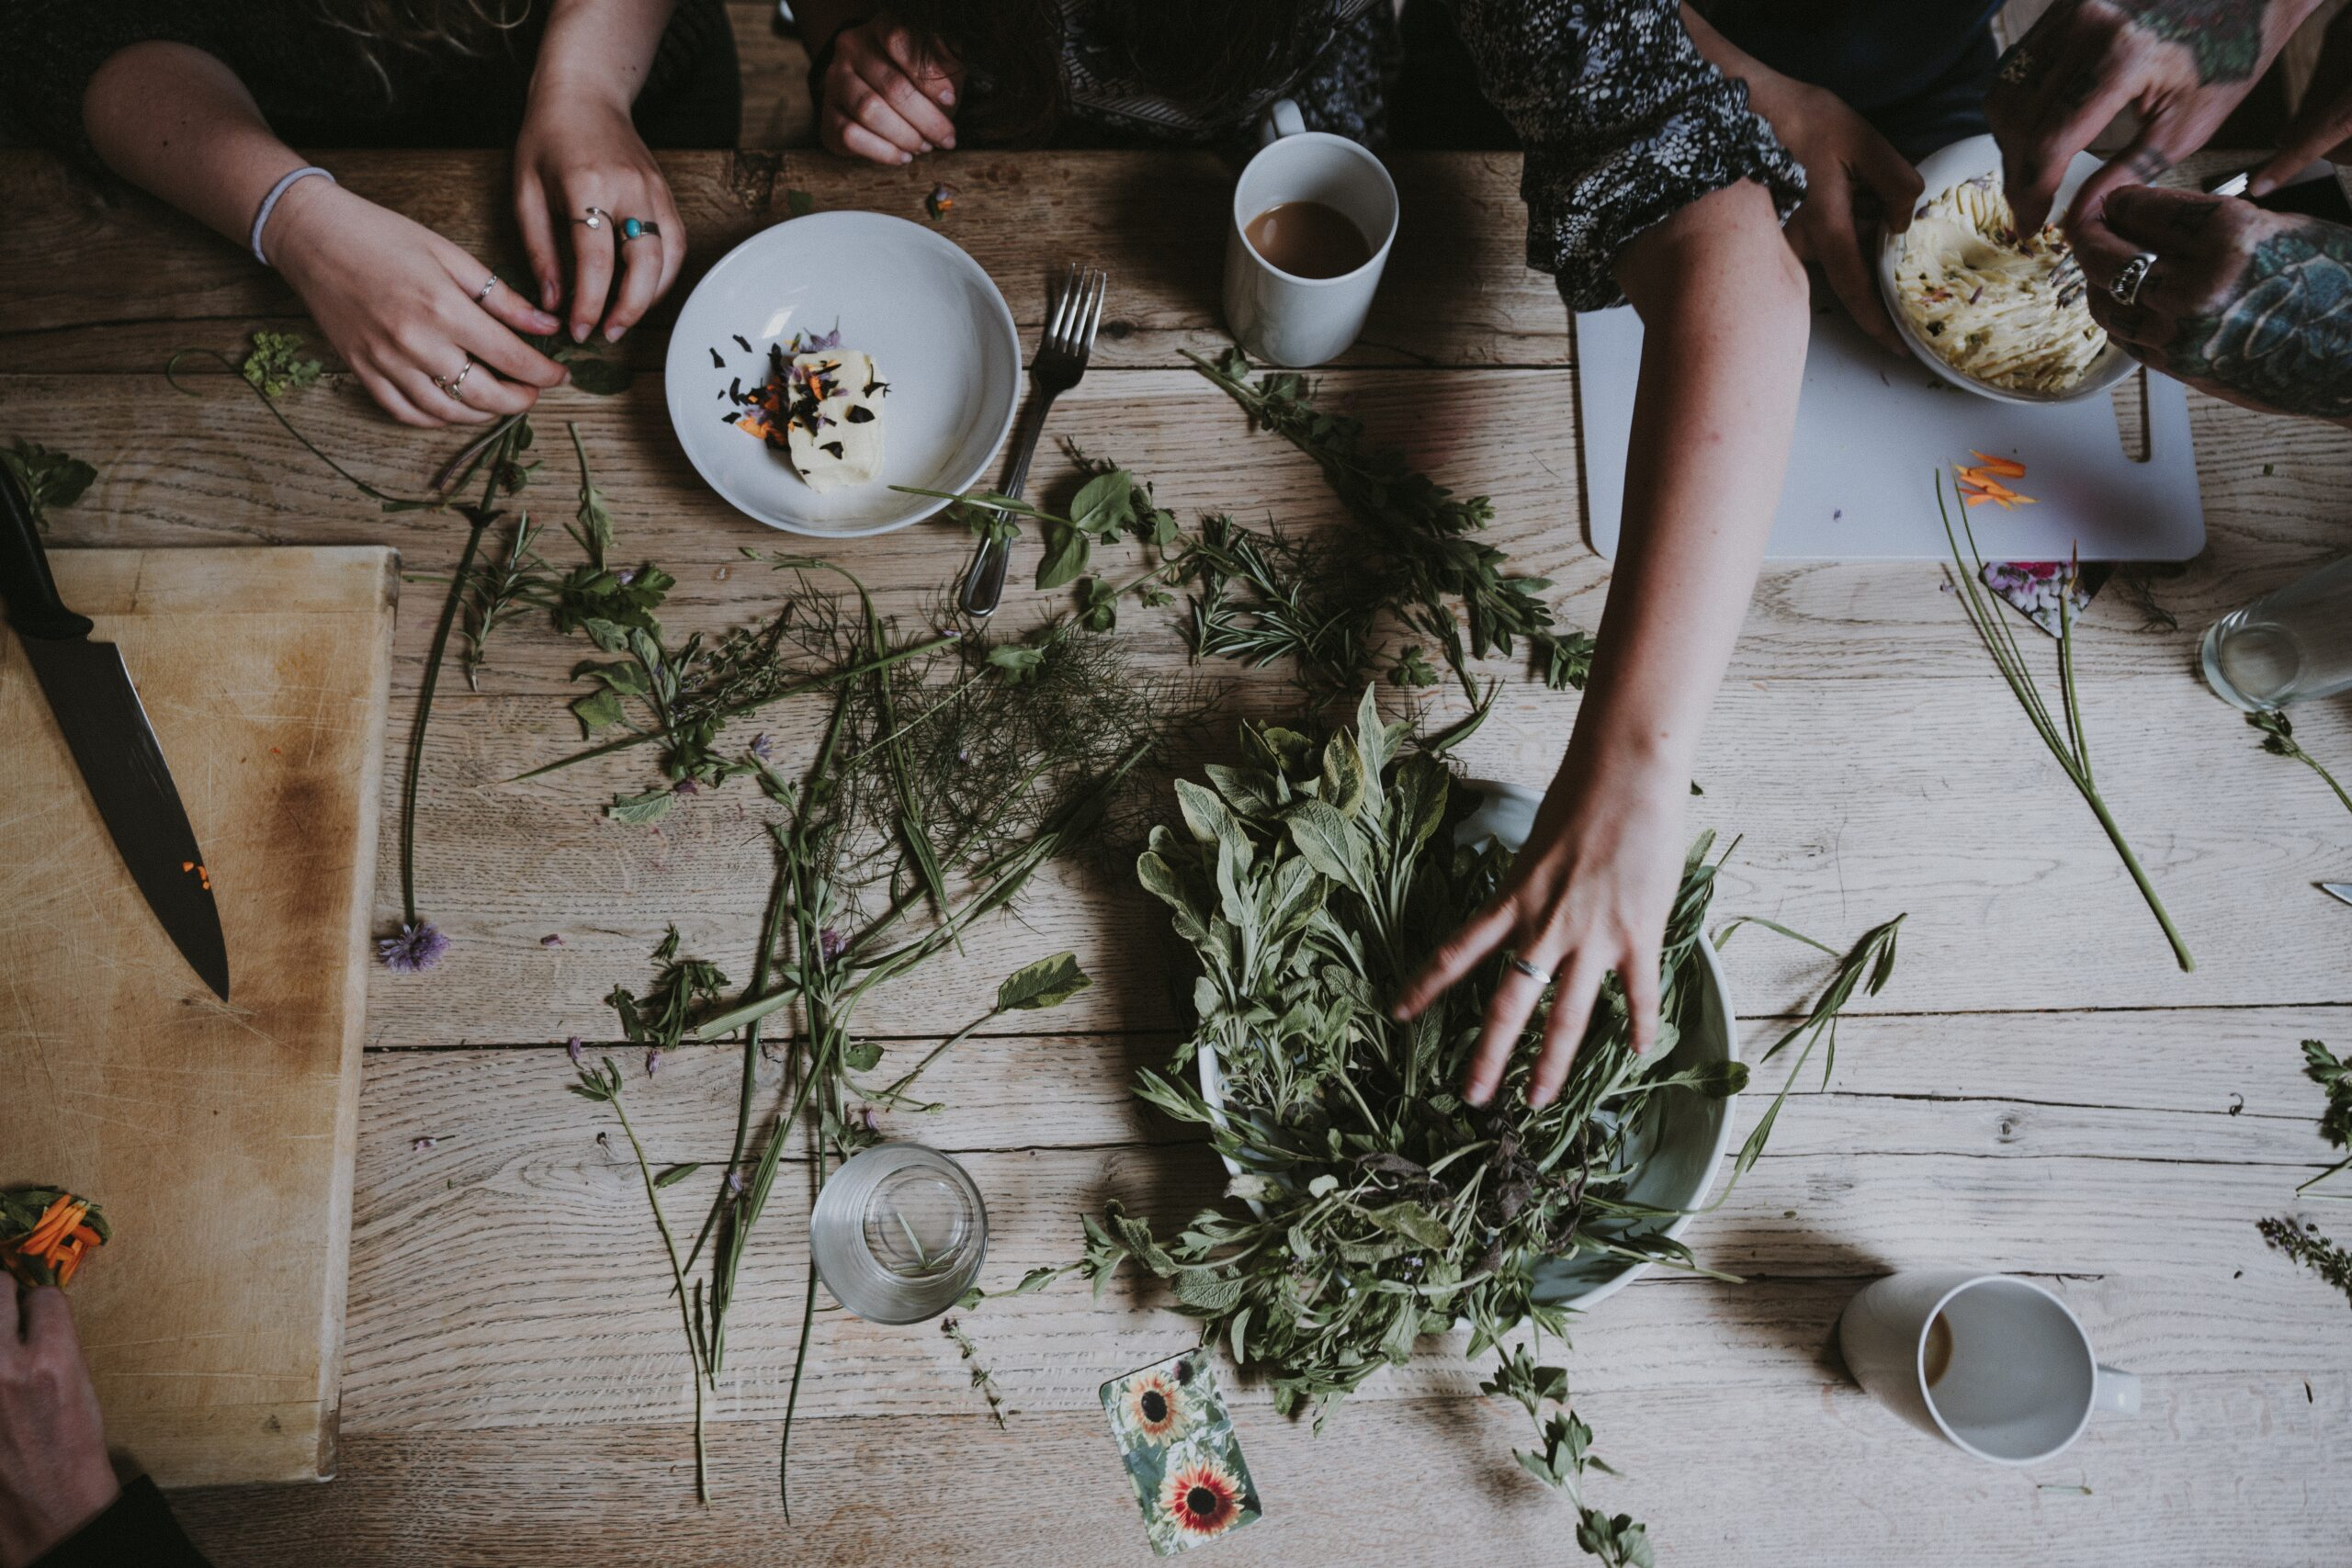 Family chopping herbs